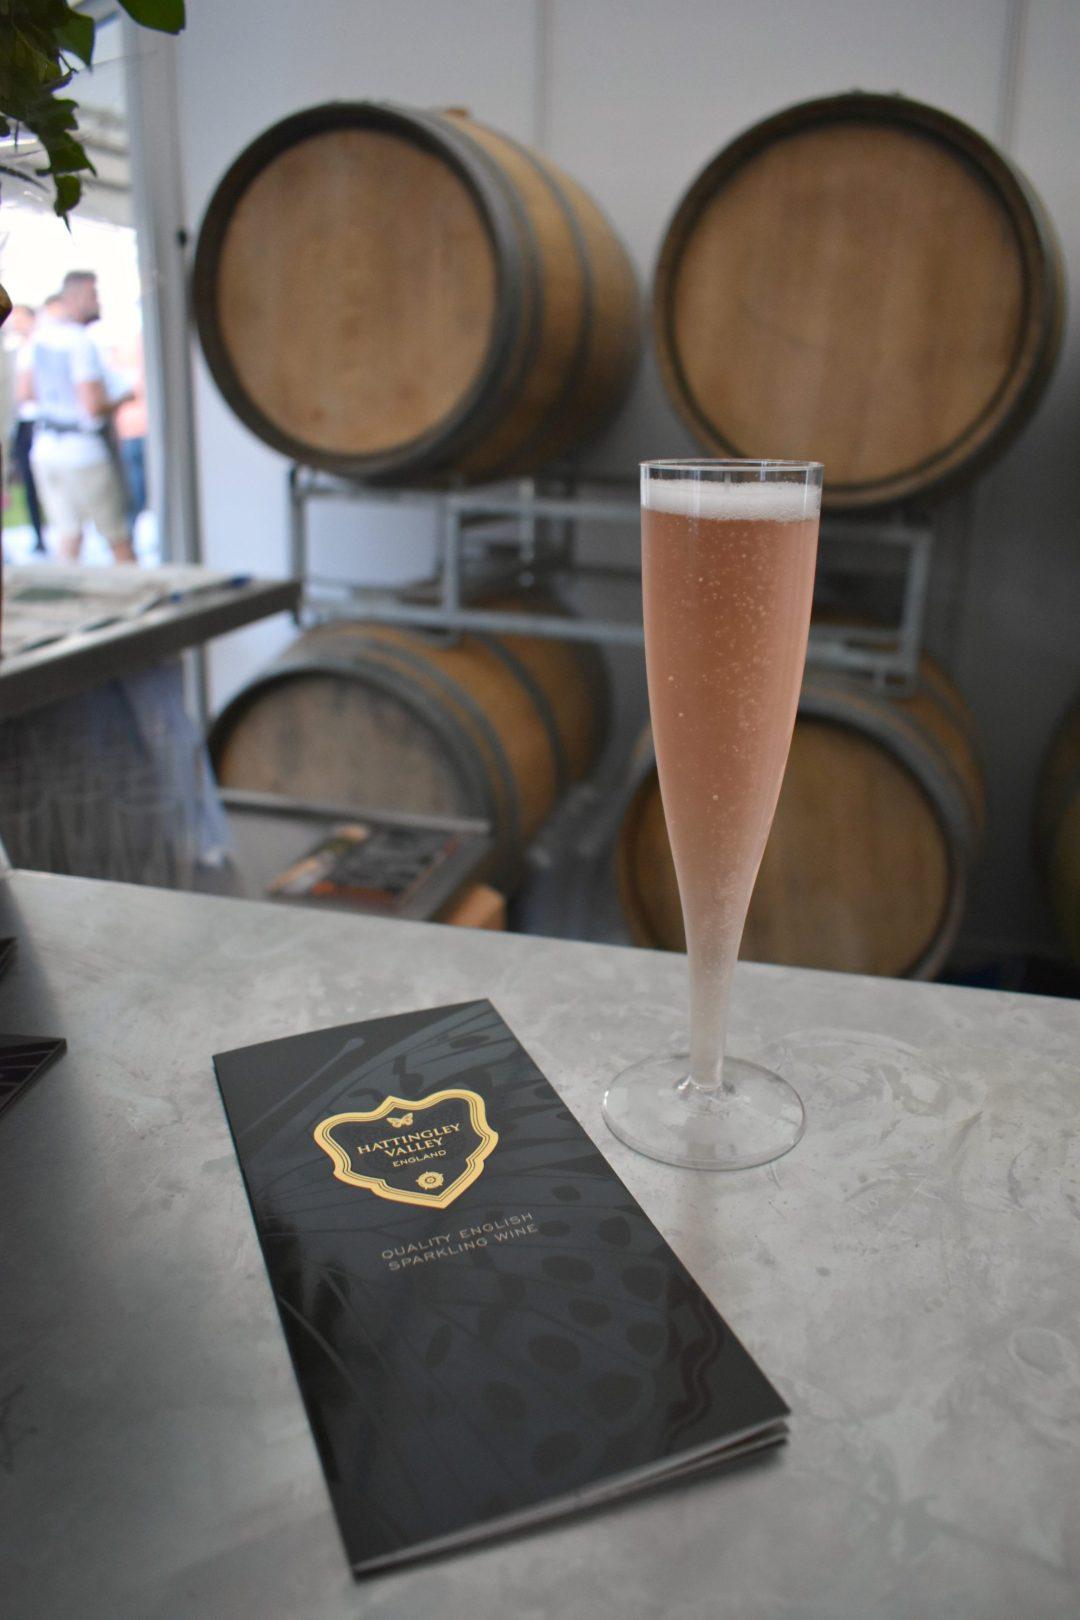 Hattingley Valley Winery at Taste of London